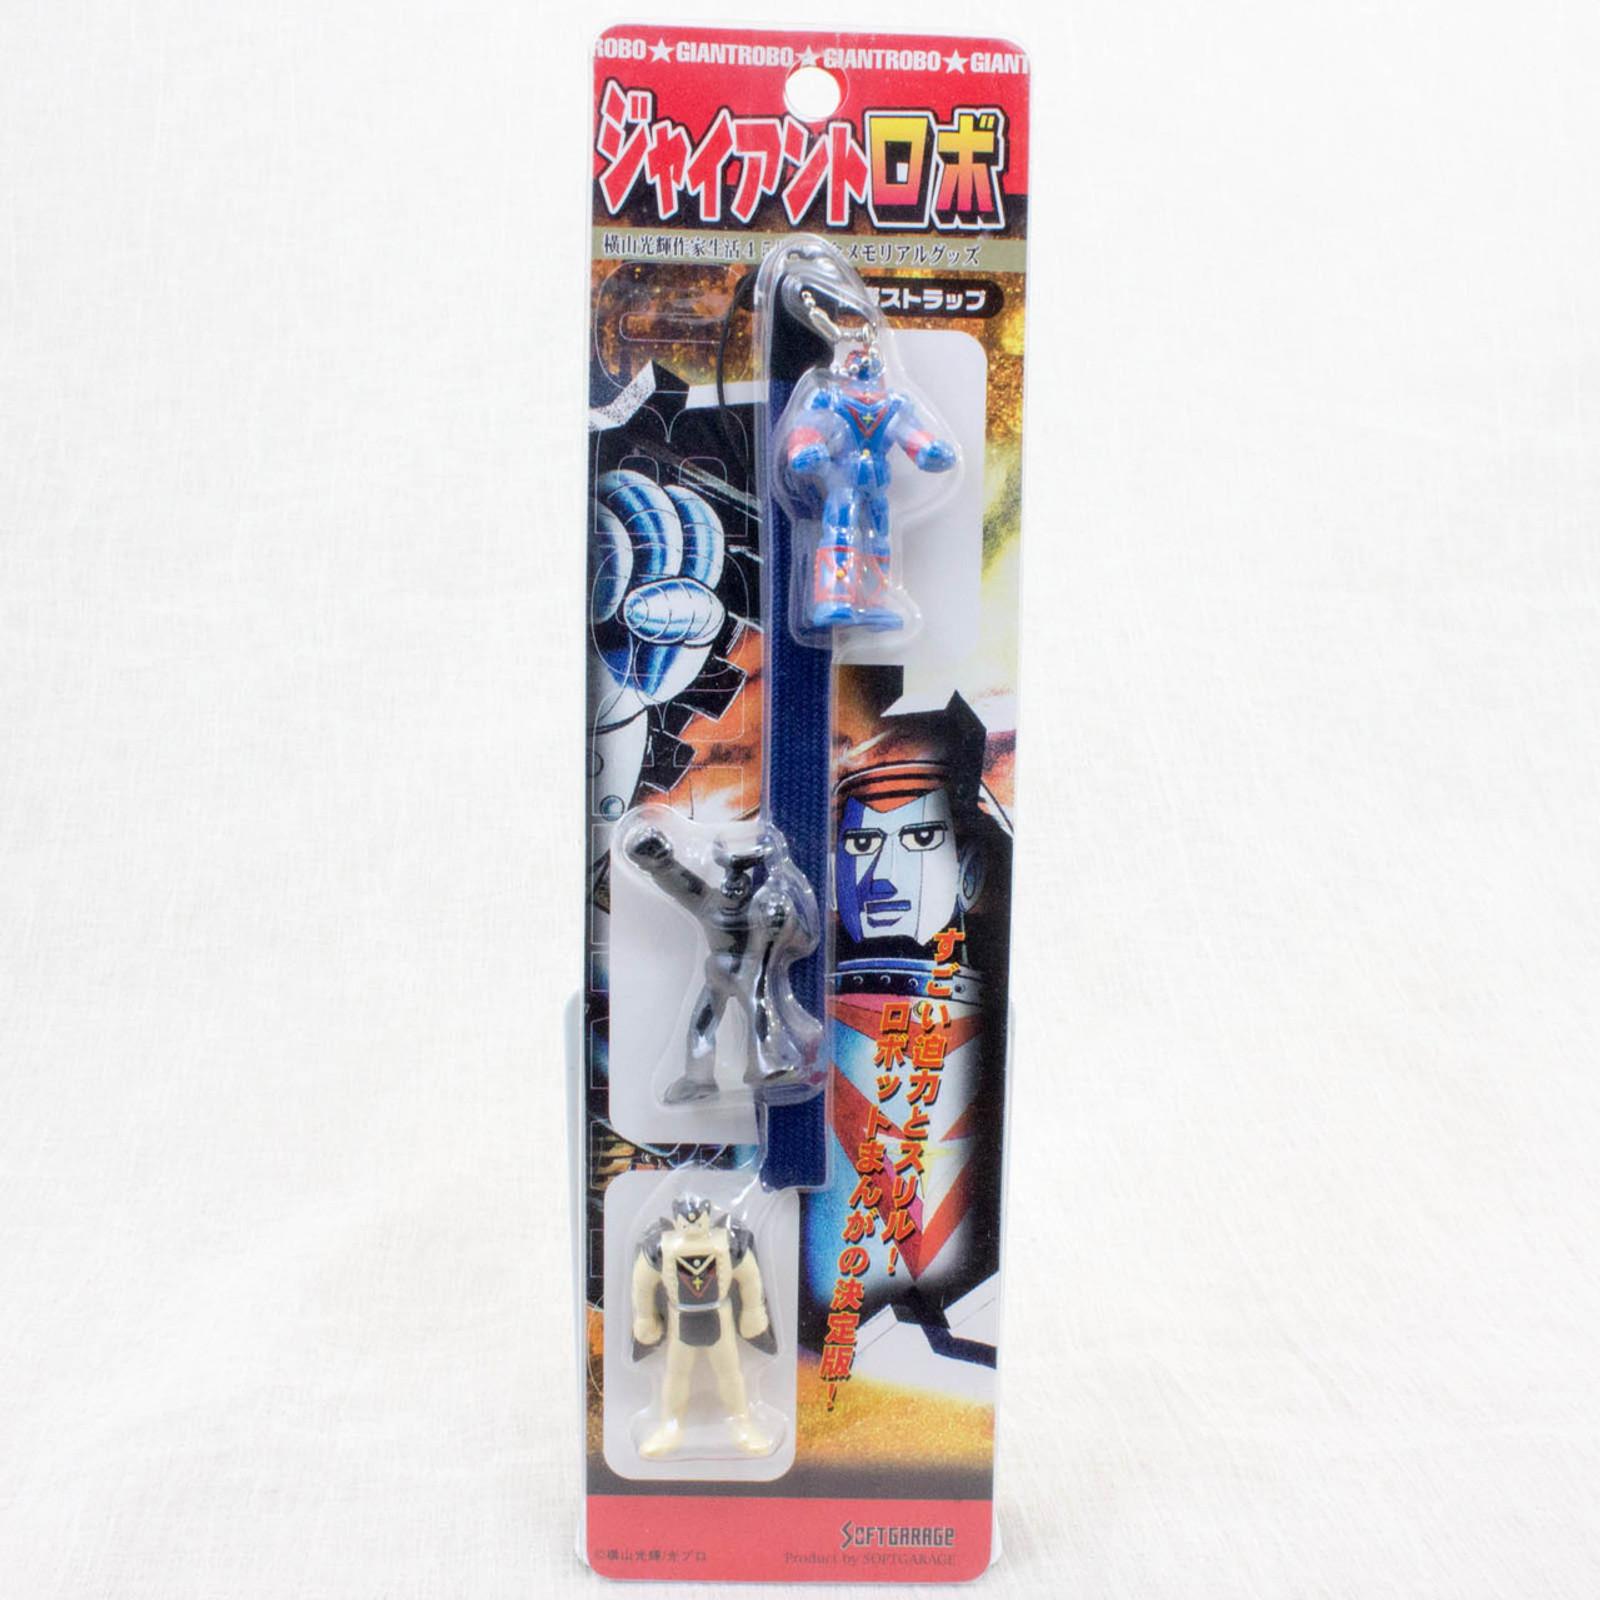 Giant Robo GR1 GR2 GR3 triple Figure Strp Mitsuteru Yokoyama JAPAN ANIME MANGA